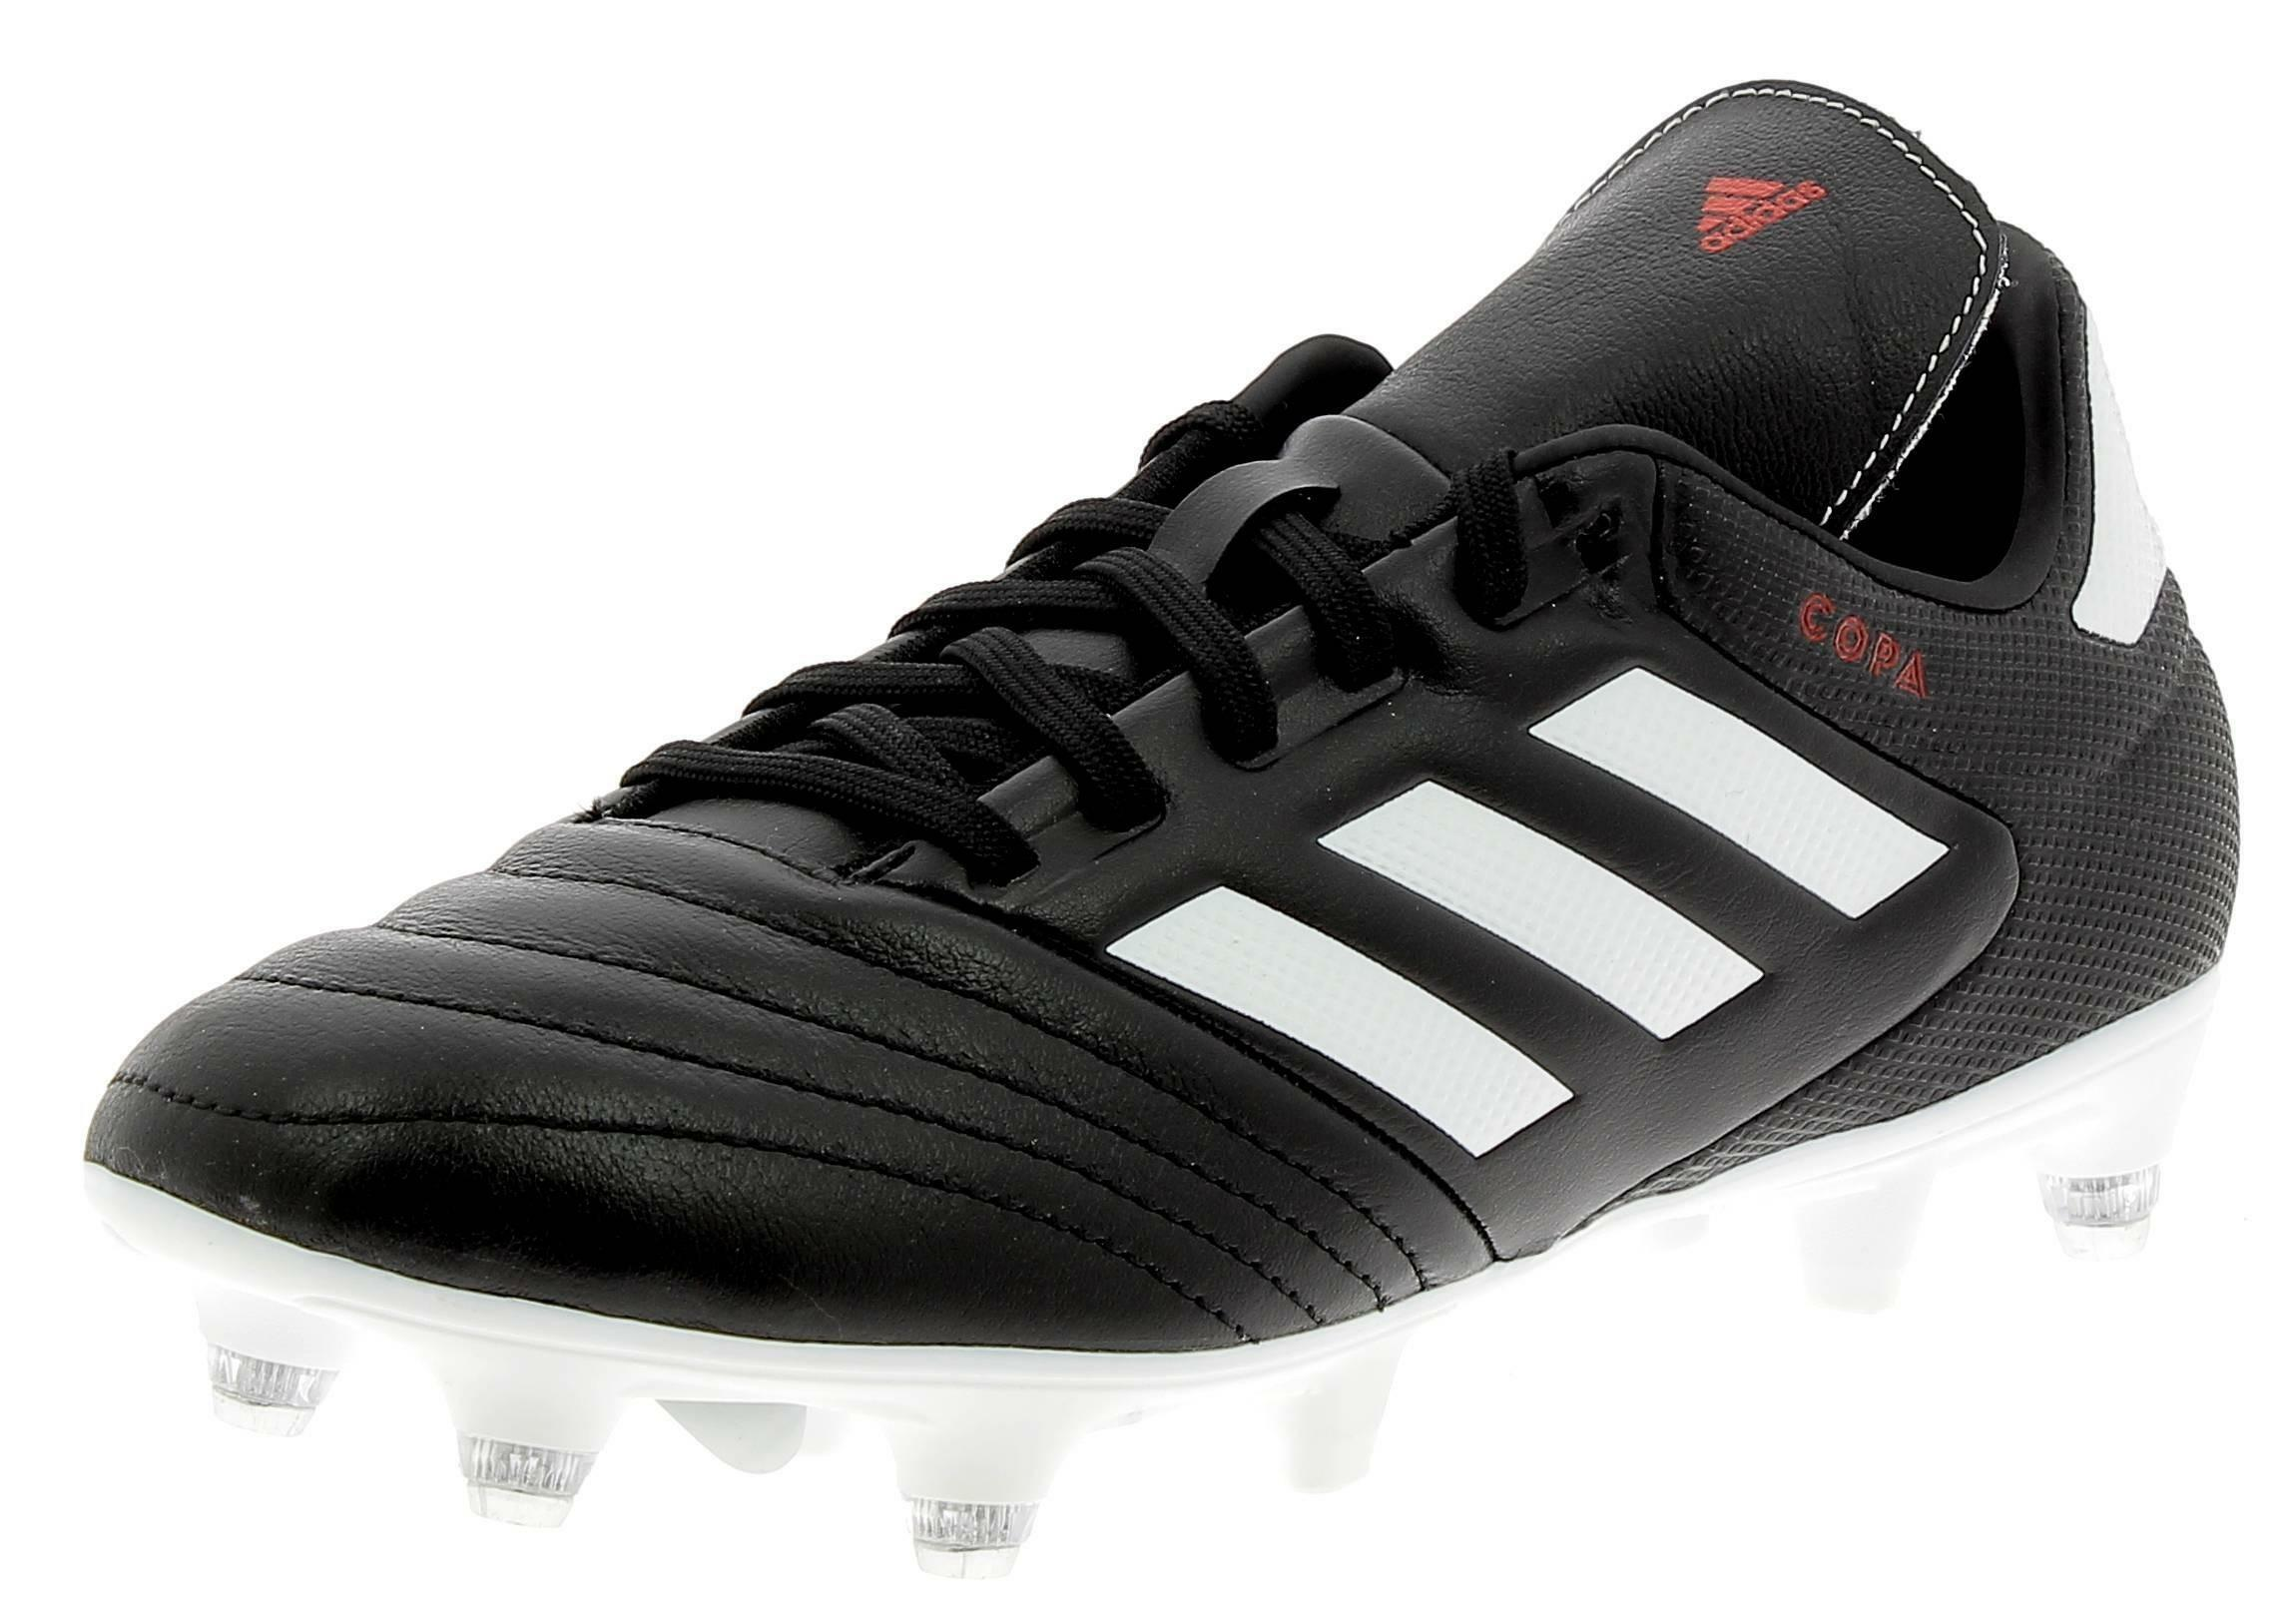 adidas adidas copa 17.3 sg scarpini calcio uomo neri